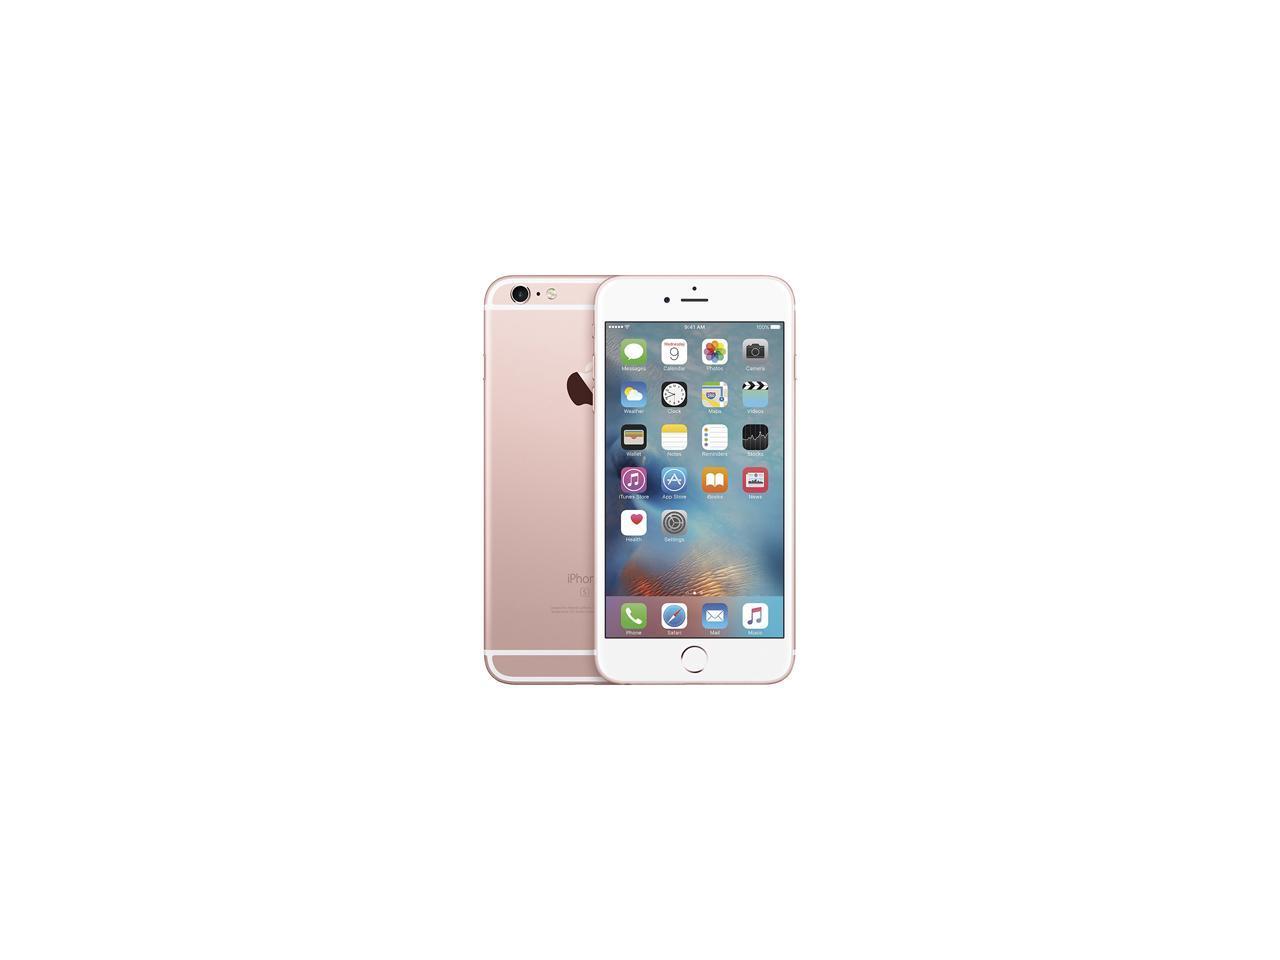 Apple iPhone 6s Plus 4G LTE Unlocked GSM Dual-Core Phone w ...